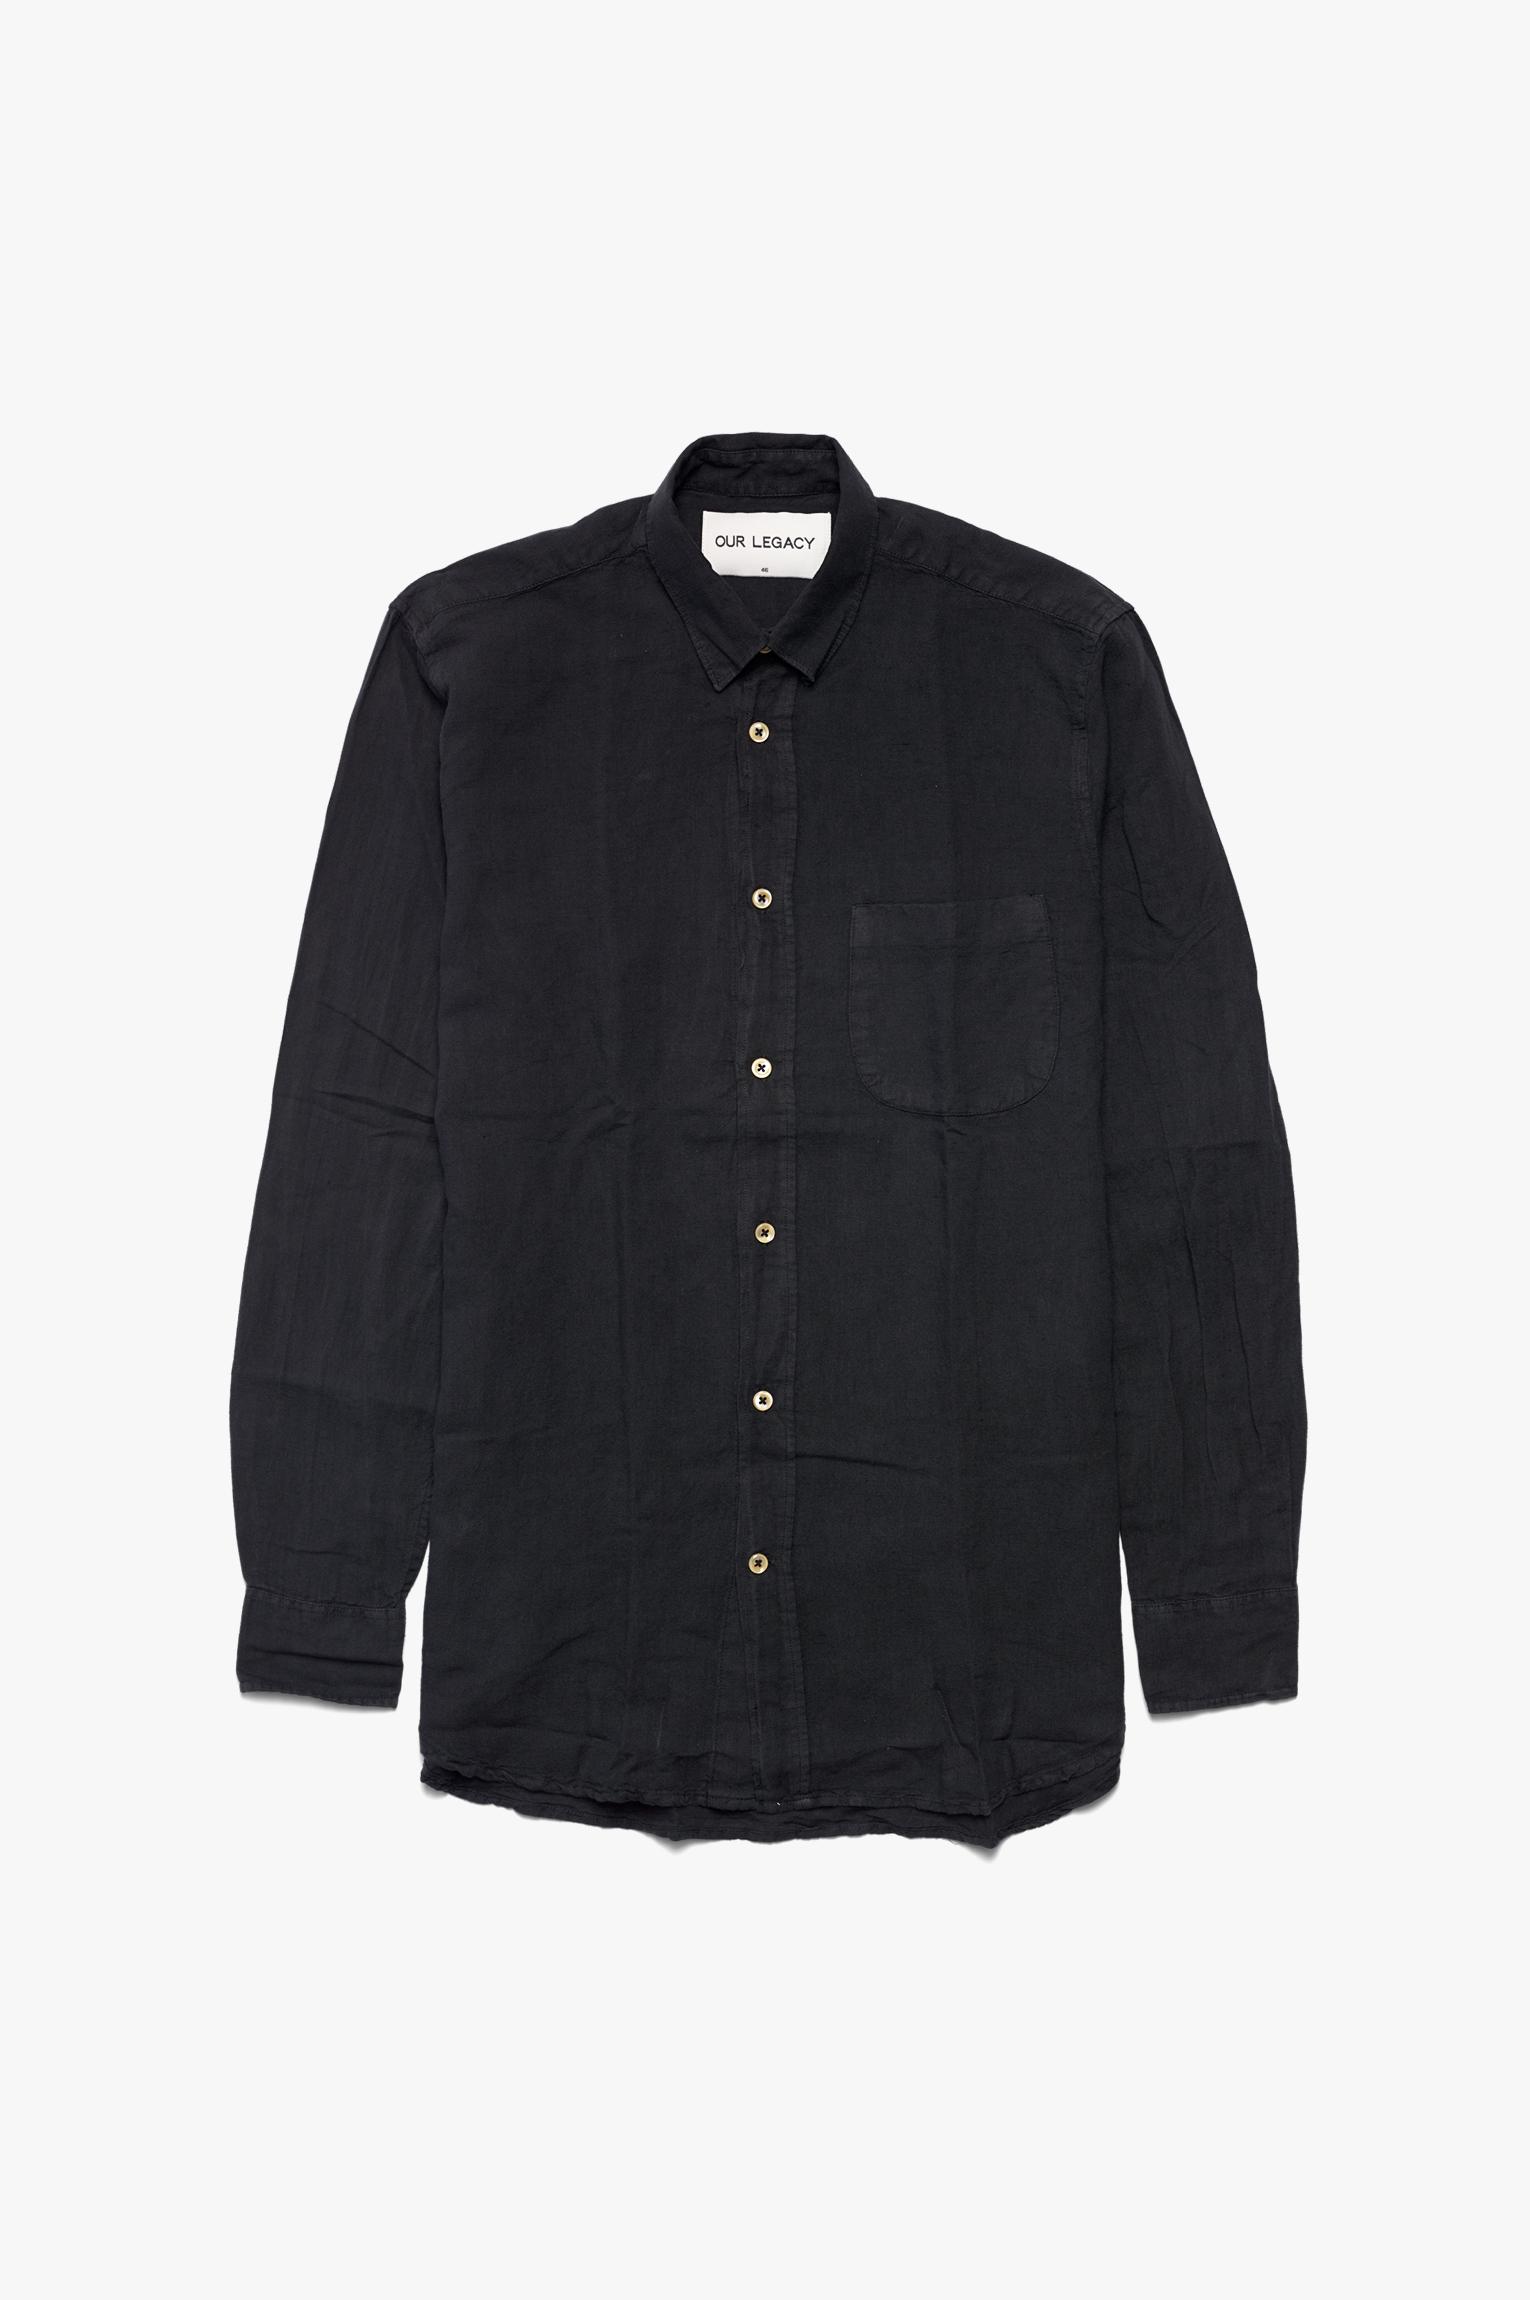 Generation Shirt Black